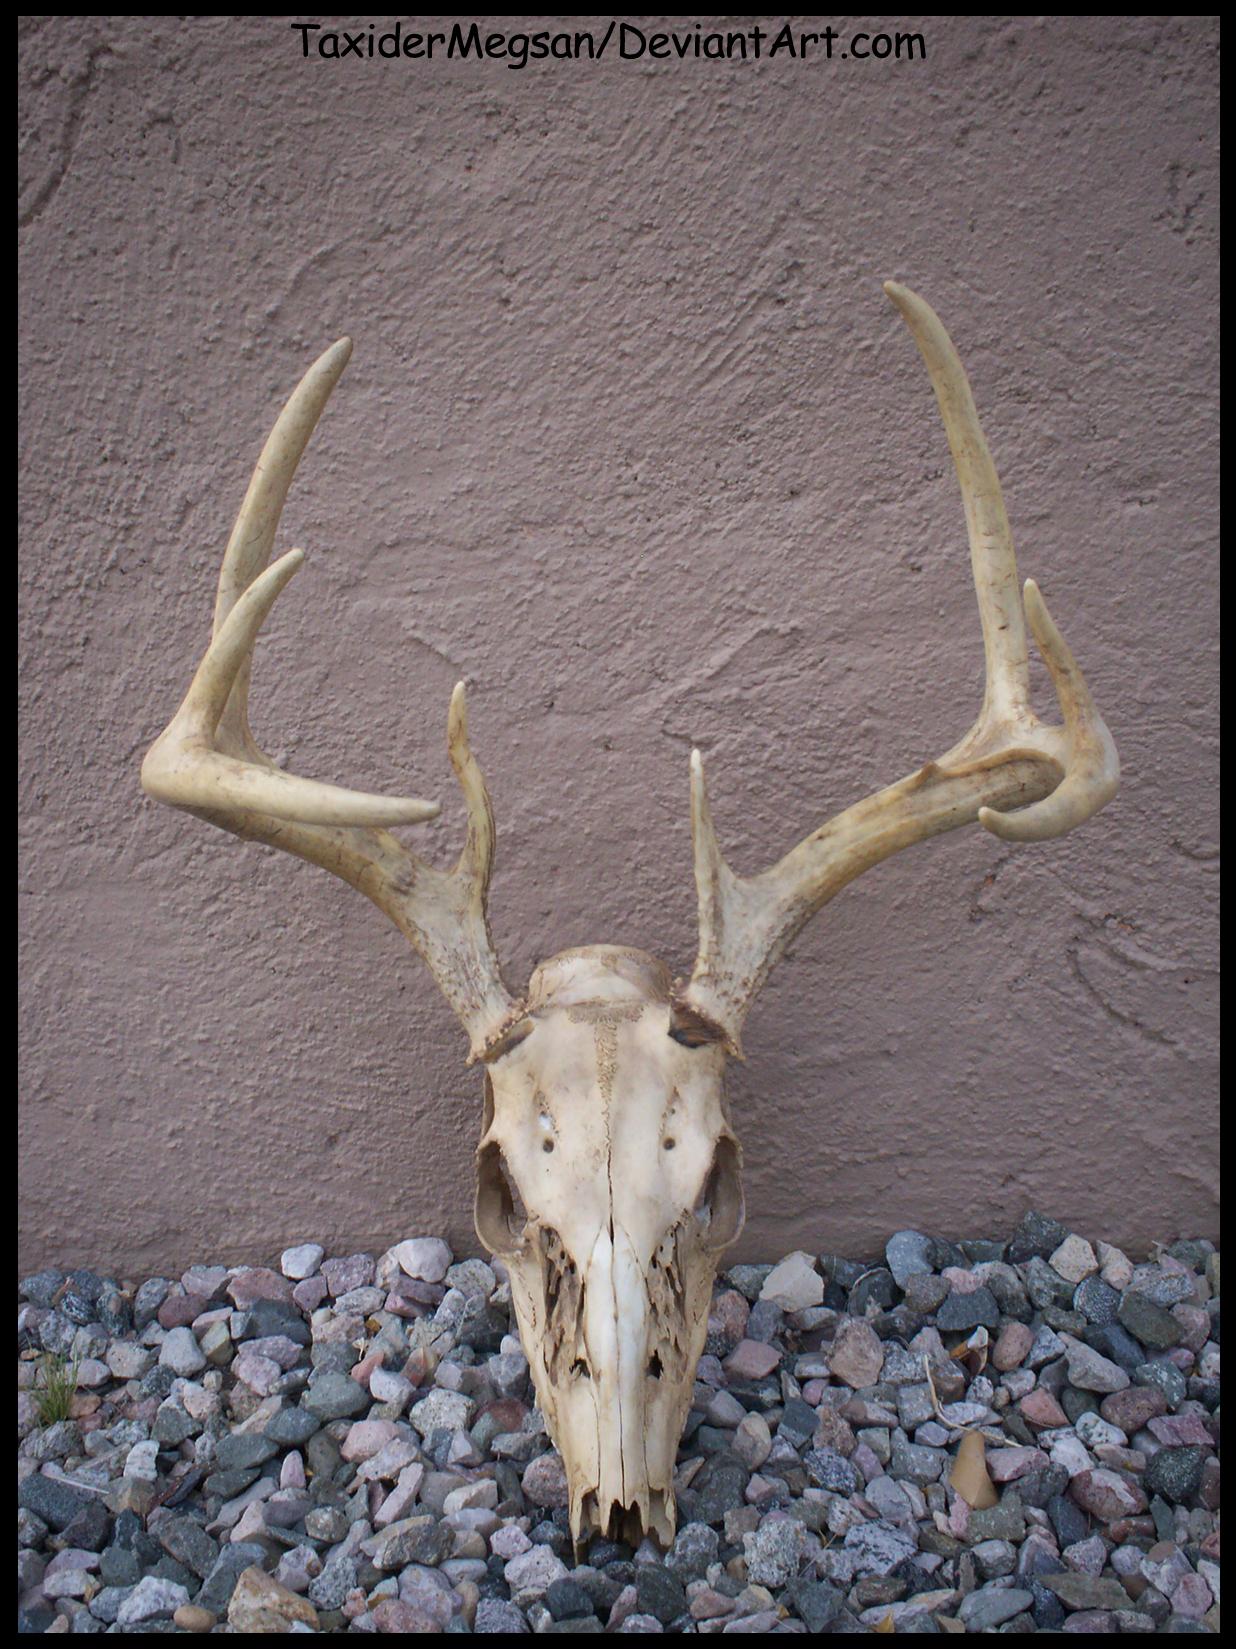 WhiteTail Deer skull -TaxiderMegsan- by TaxiderMegsan on DeviantArt